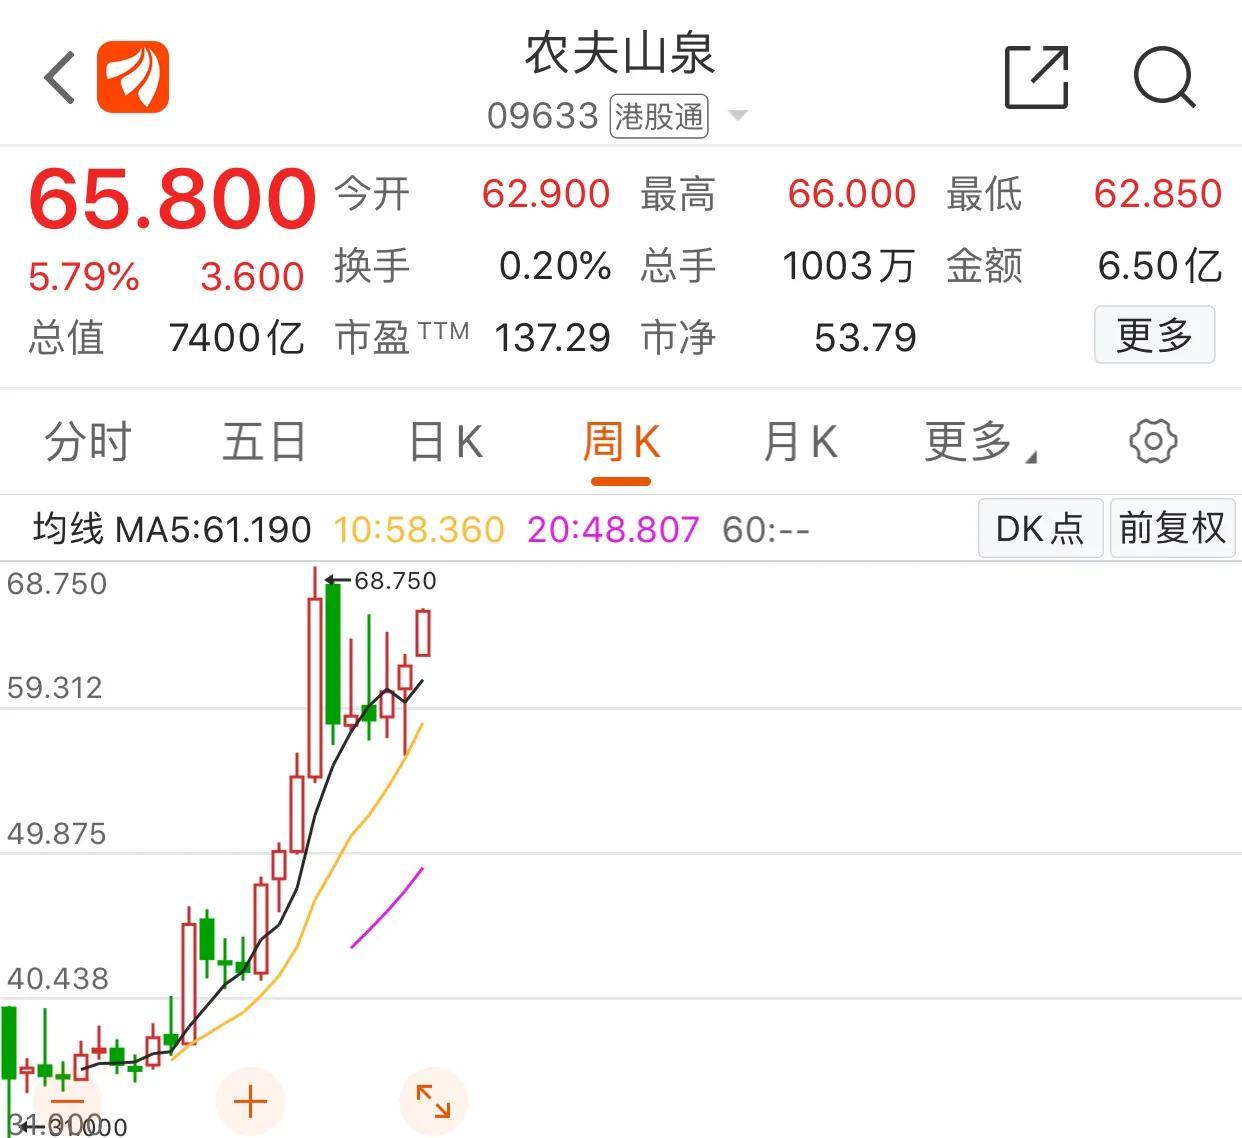 A股市场唯一矿泉水标的,总市值87亿元,这个估值怎么样?